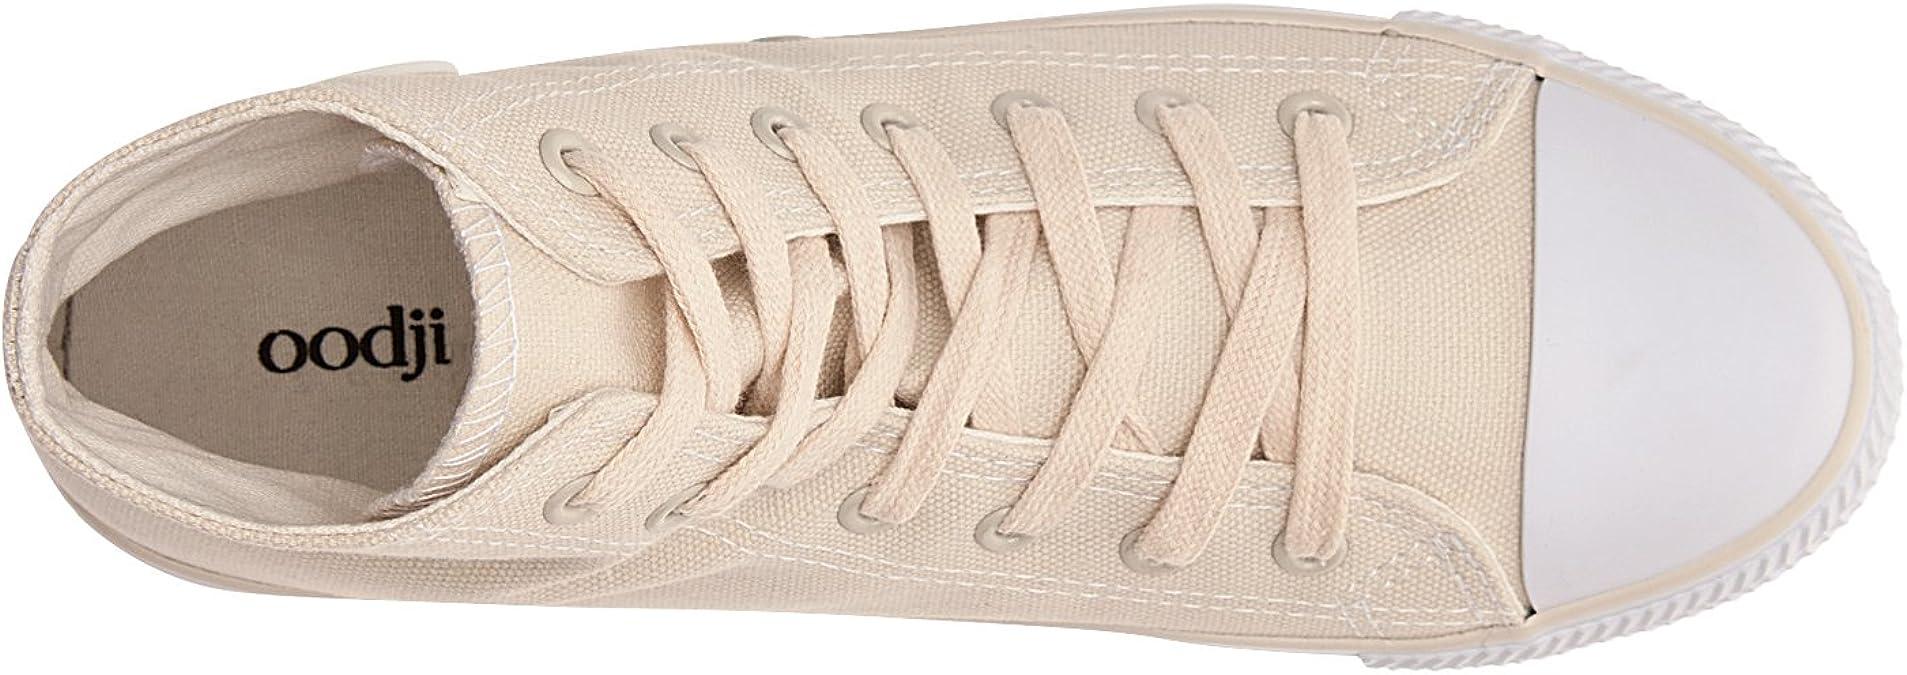 oodji Ultra Femme Baskets Montantes en Tissu de Coton